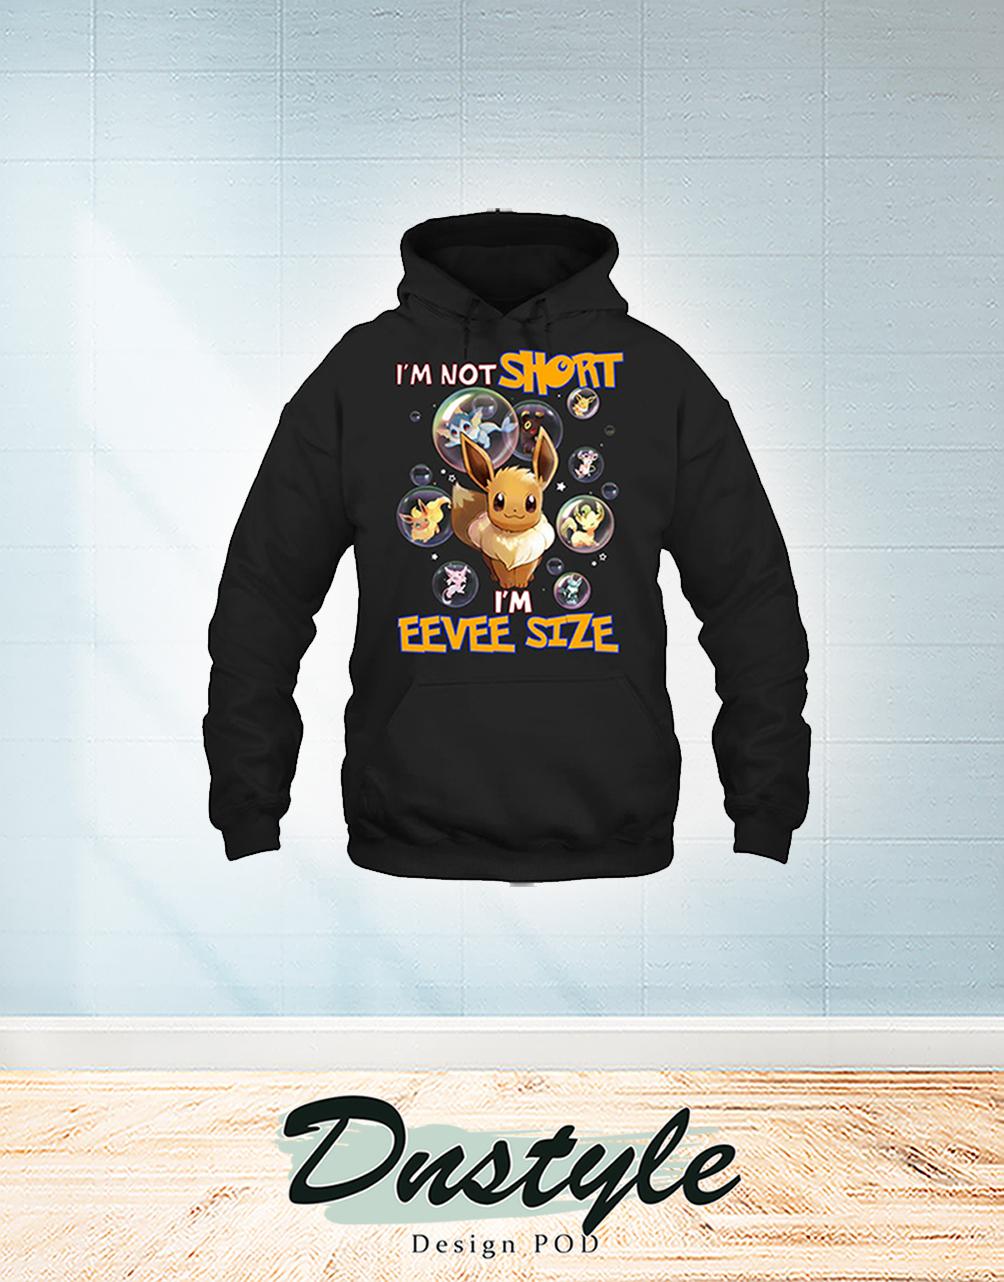 I'm not short I'm eevee size hoodie